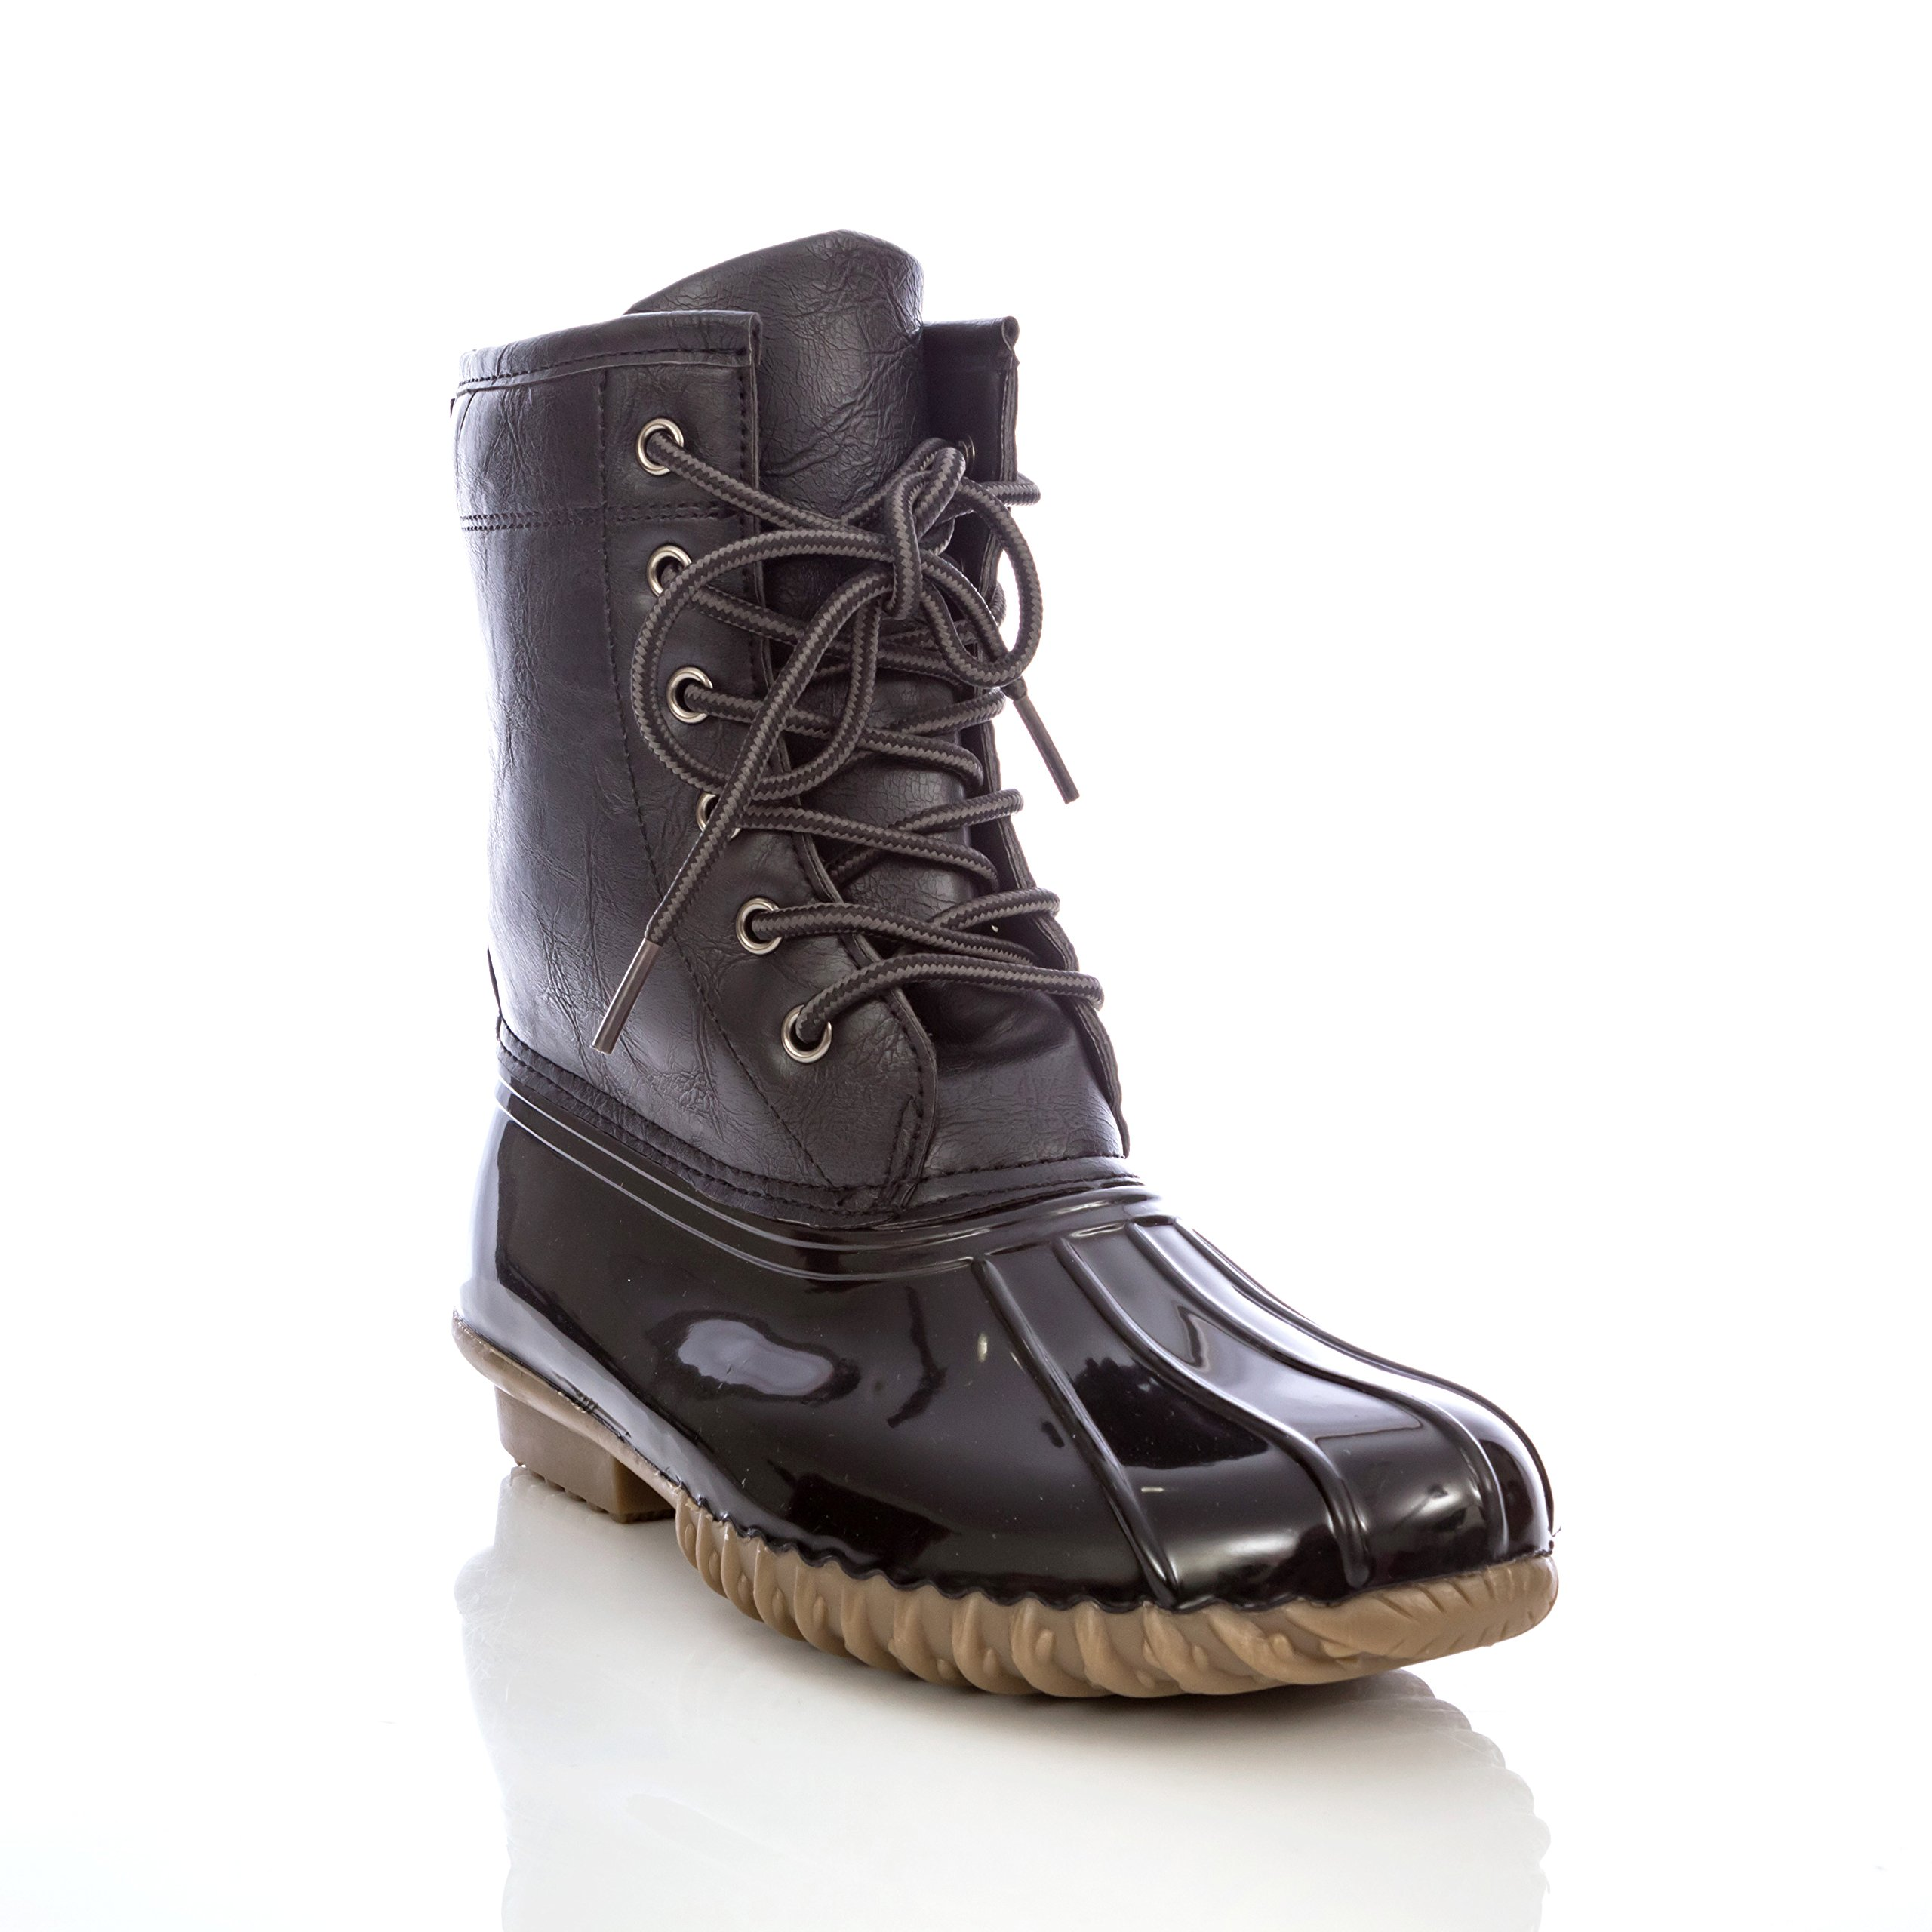 Charles Albert Women's Lace-up Insulated Mid-Calf Waterproof Duck Rain Boots (7, Black)